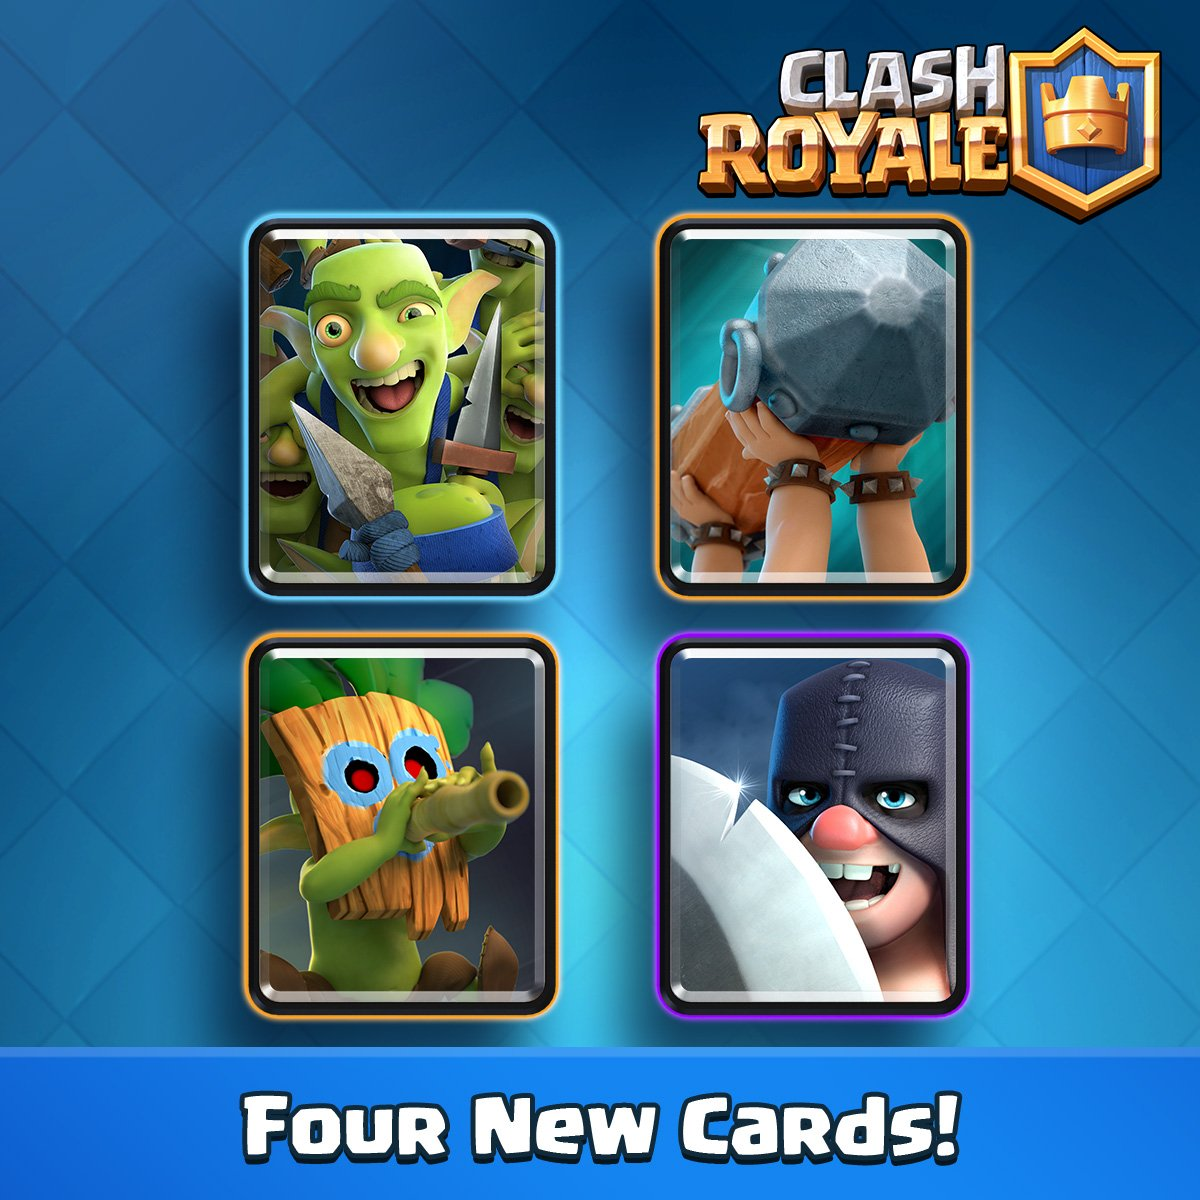 Clash Royale On Twitter Sneak Peek 2 Four New Cards